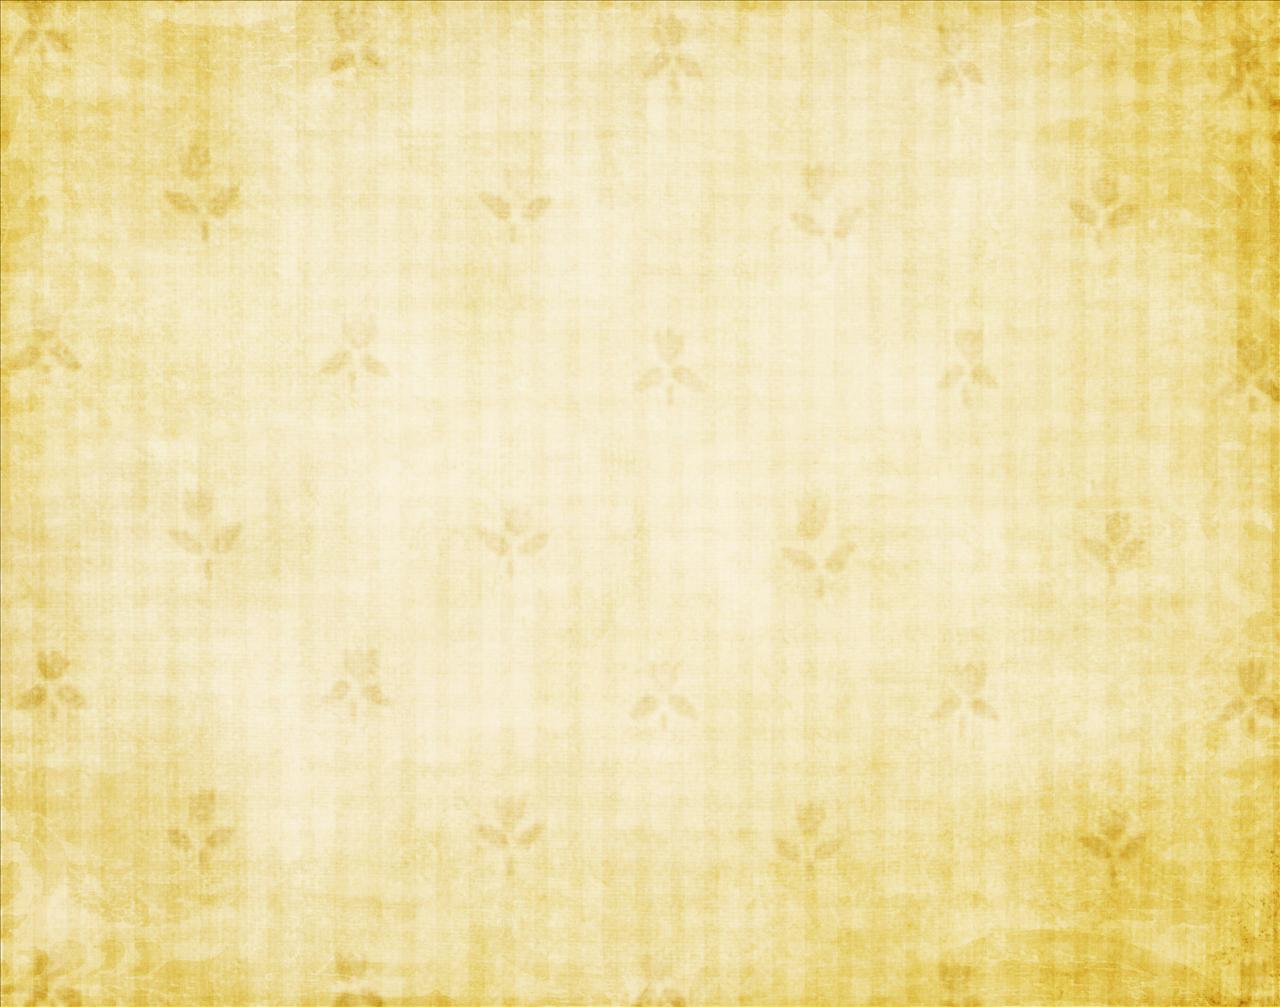 alston cotta Gray Beige Backgrounds 1280x1007